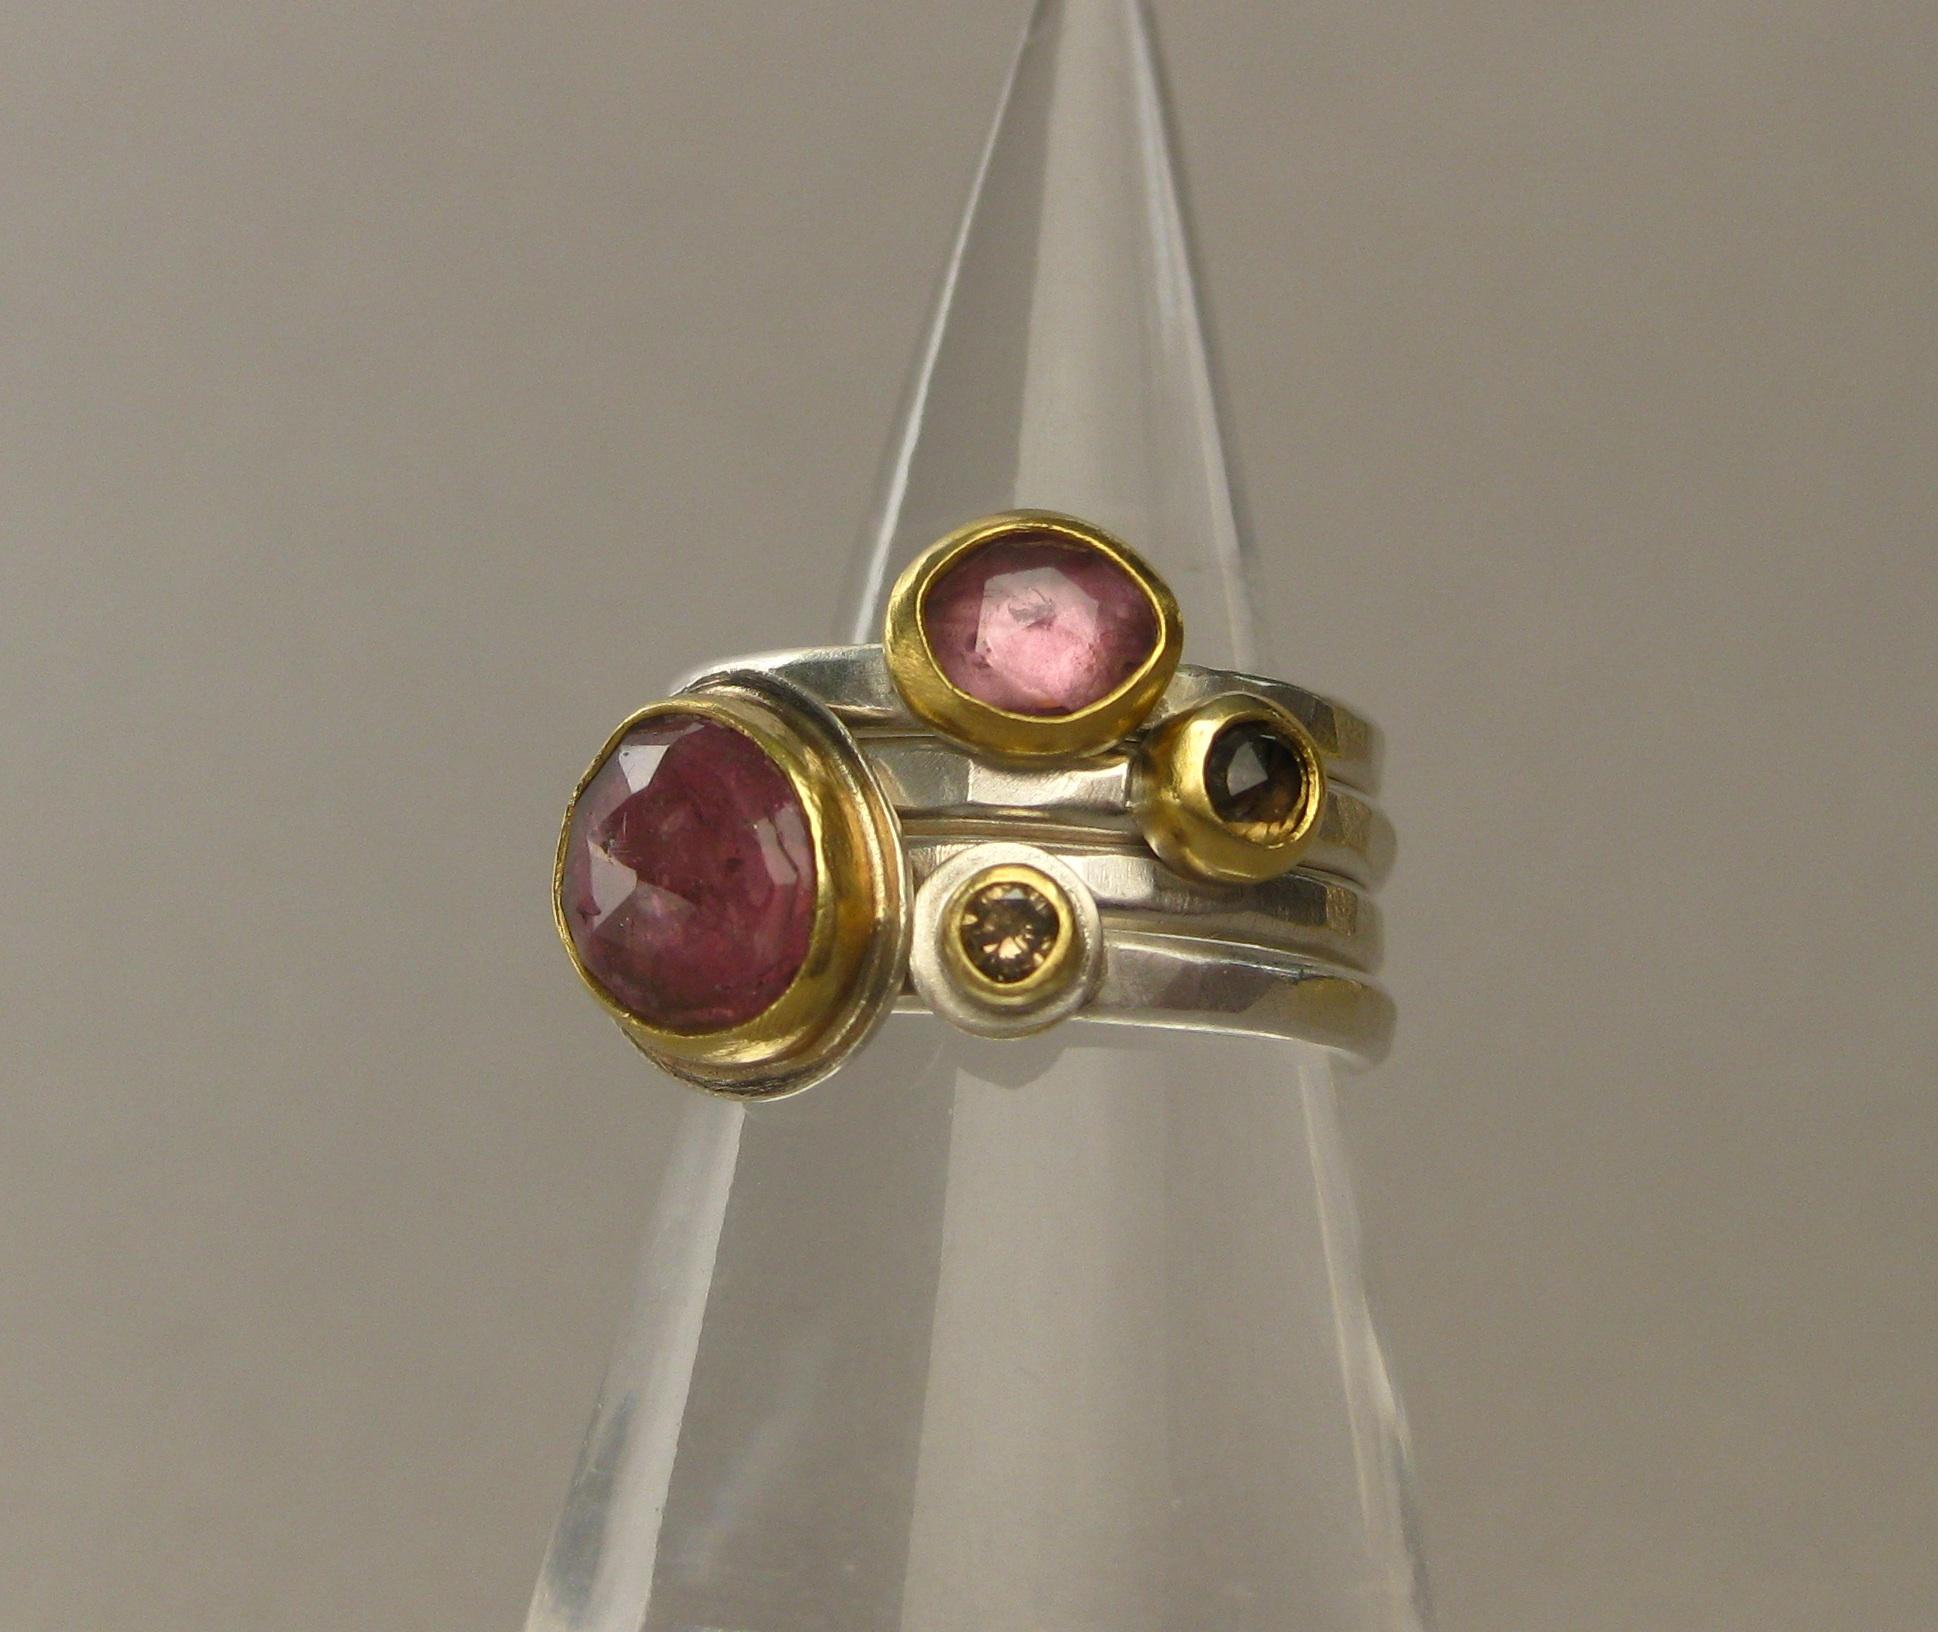 Rose Cut Pink Sapphire, Rose Cut Cognac Diamond, Rose Cut Pink Tourmaline and Champage Diamond Stacking Rings